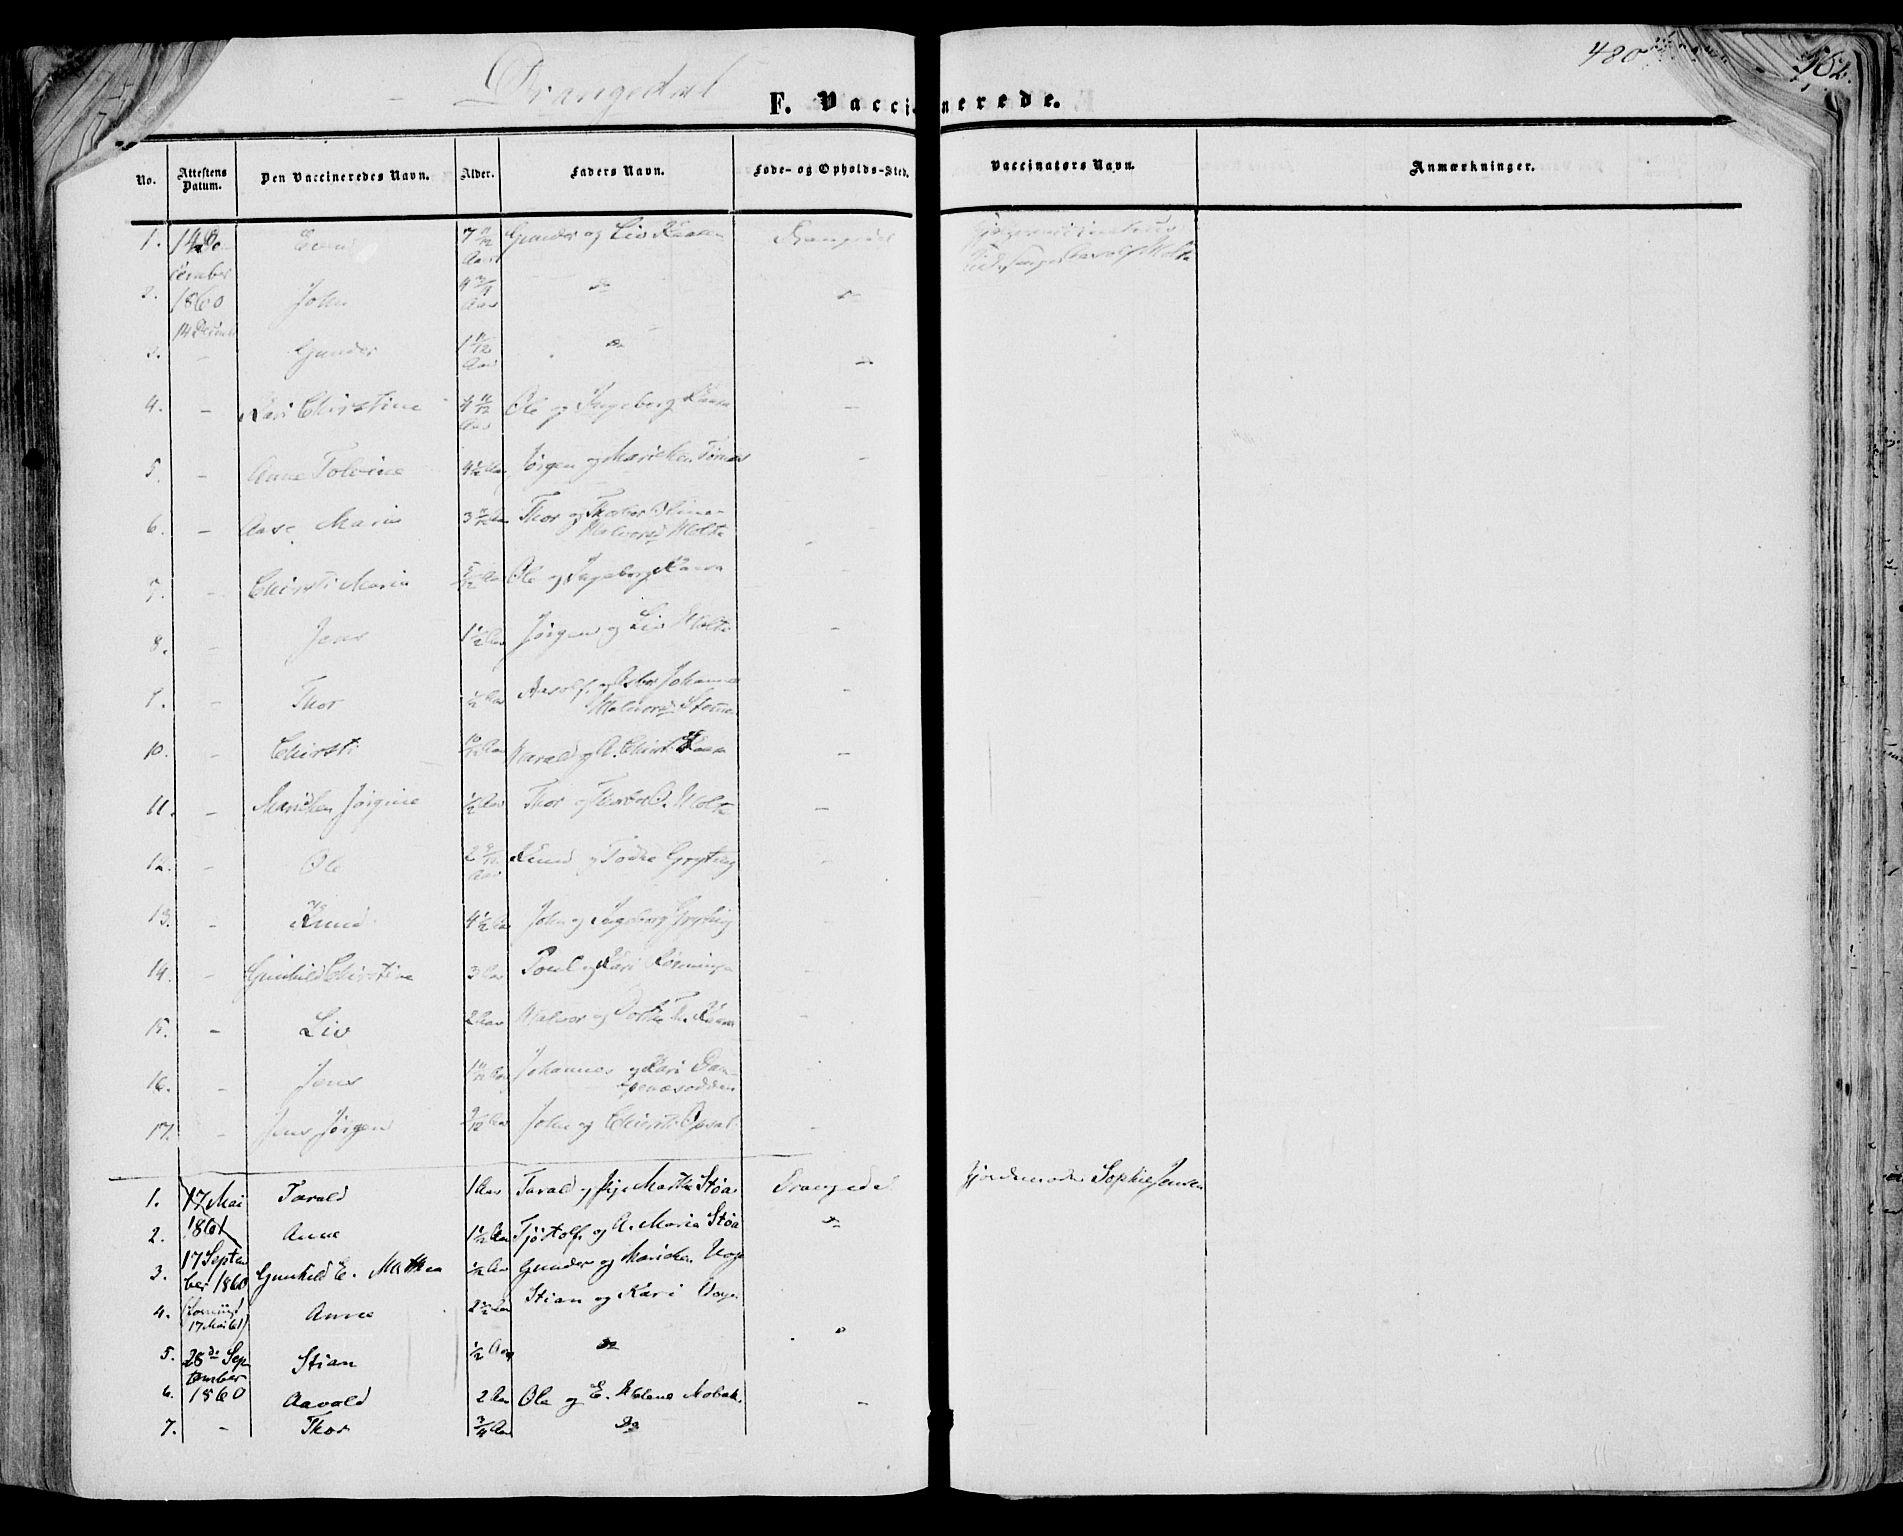 SAKO, Drangedal kirkebøker, F/Fa/L0008: Ministerialbok nr. 8, 1857-1871, s. 480